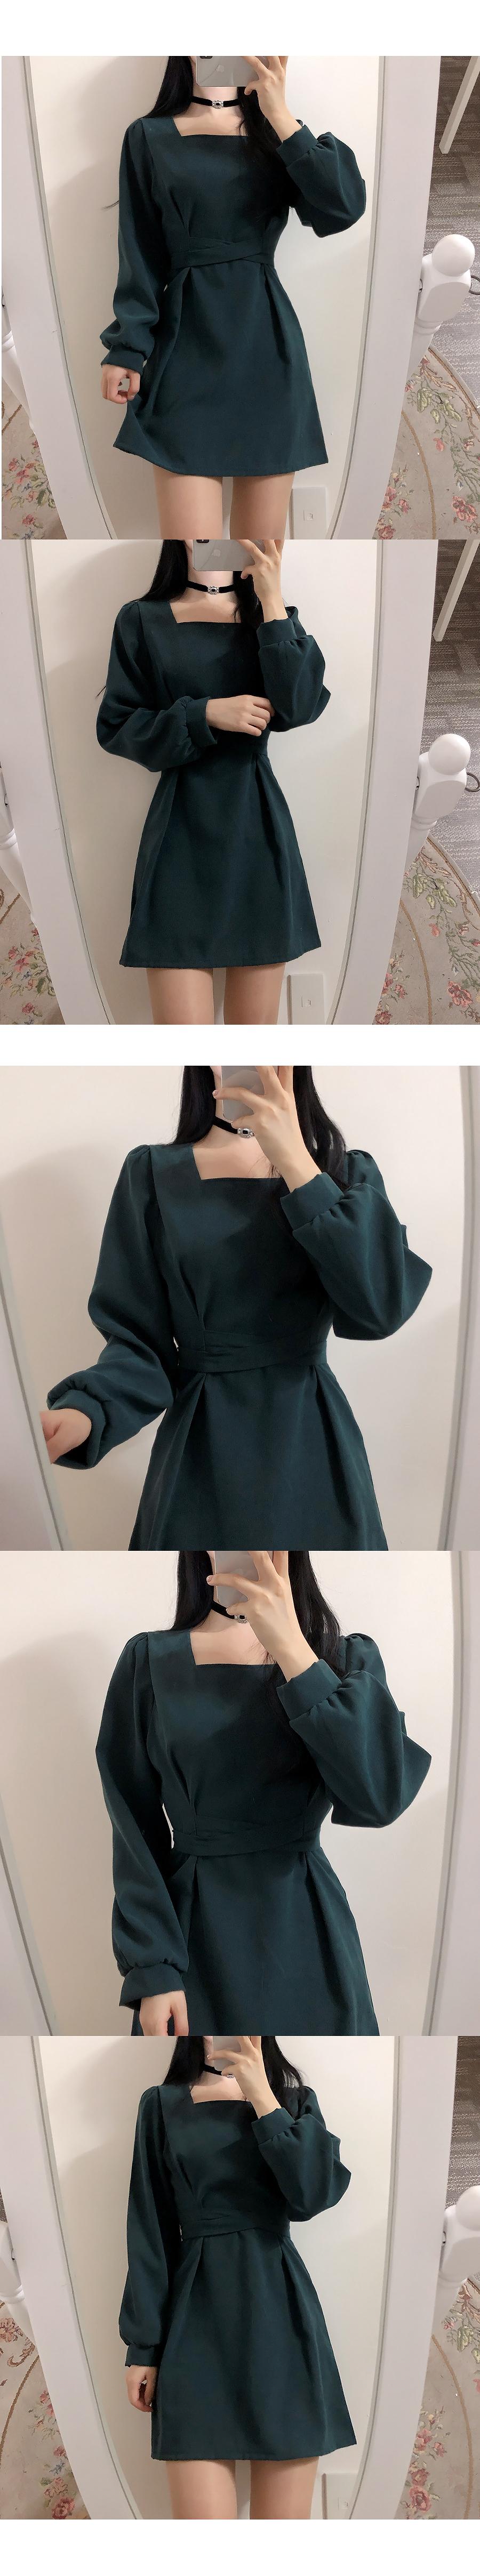 Self-made ♥ core knot square dress